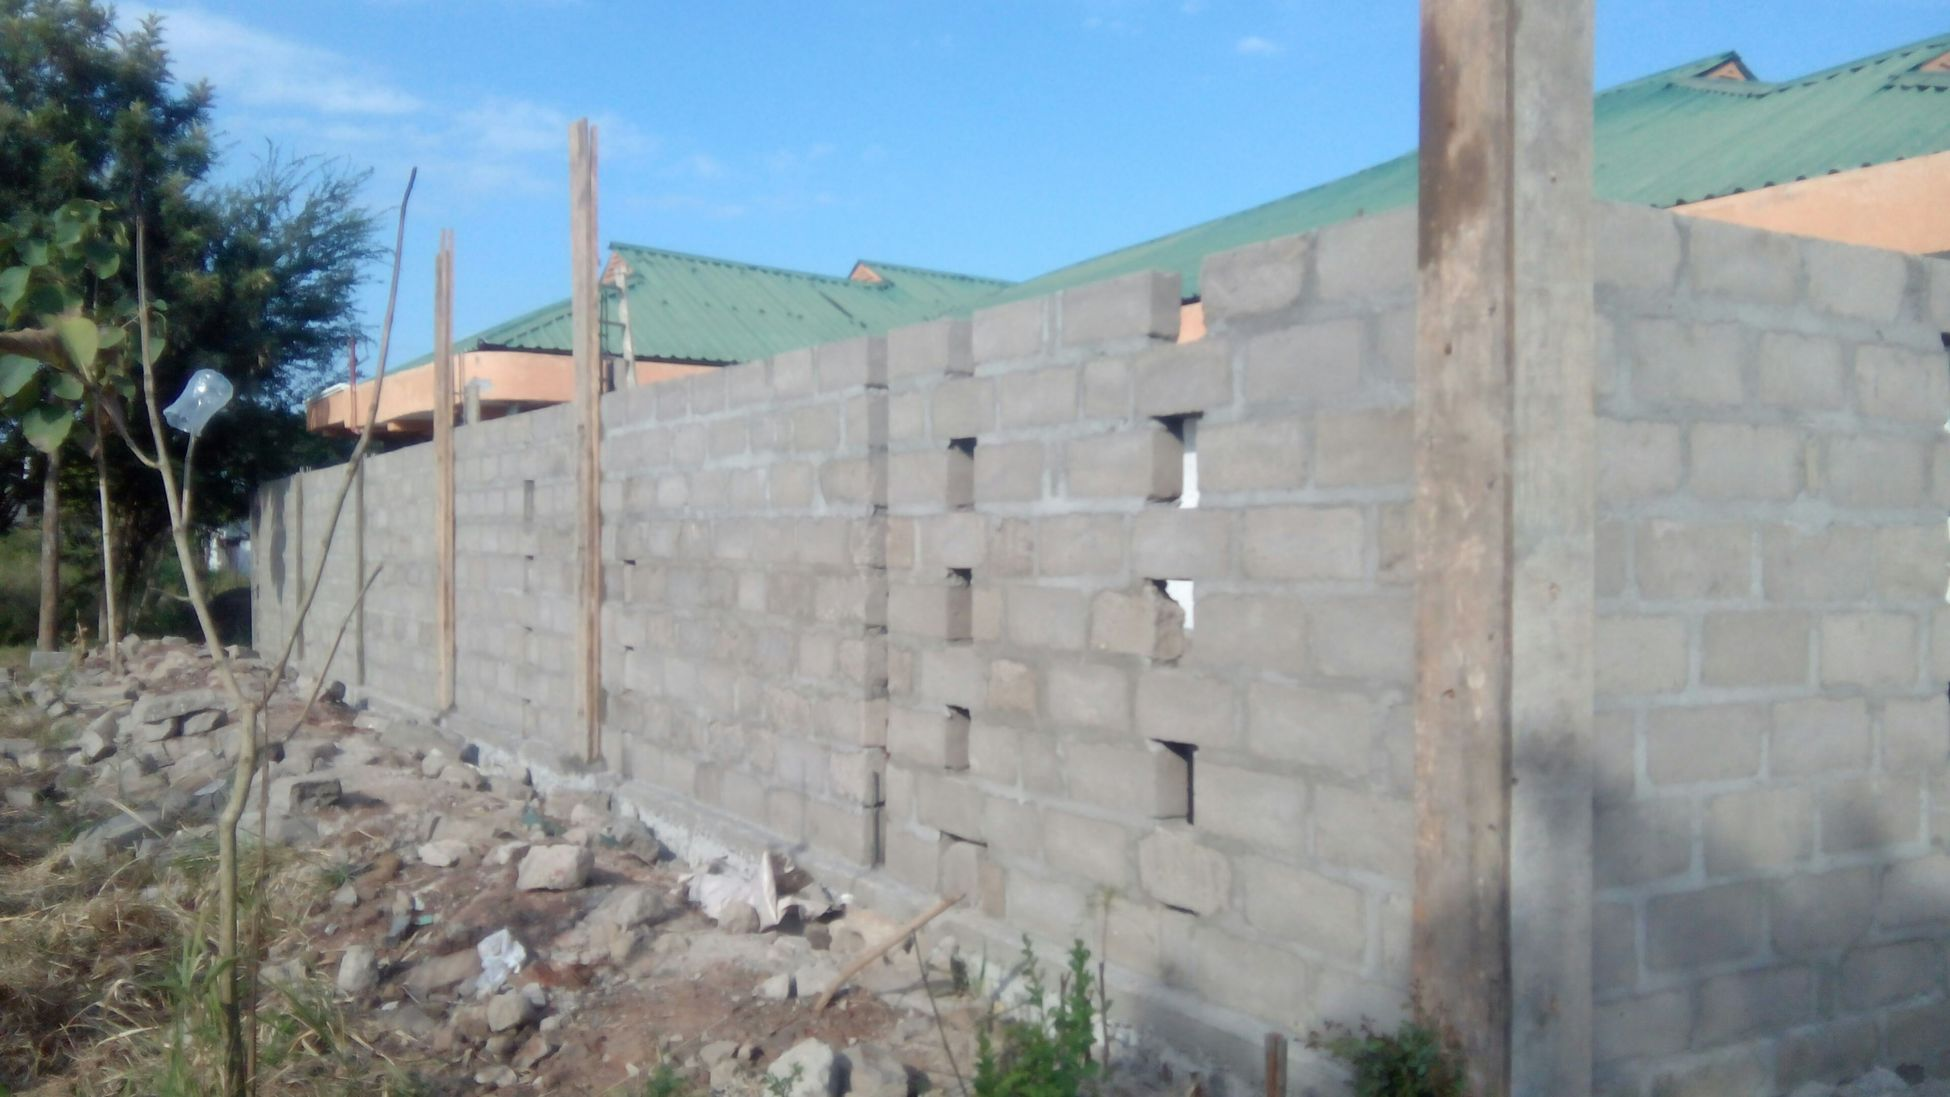 Boundary wall marvelous - EyeEm Boundary wall marvelous - 웹